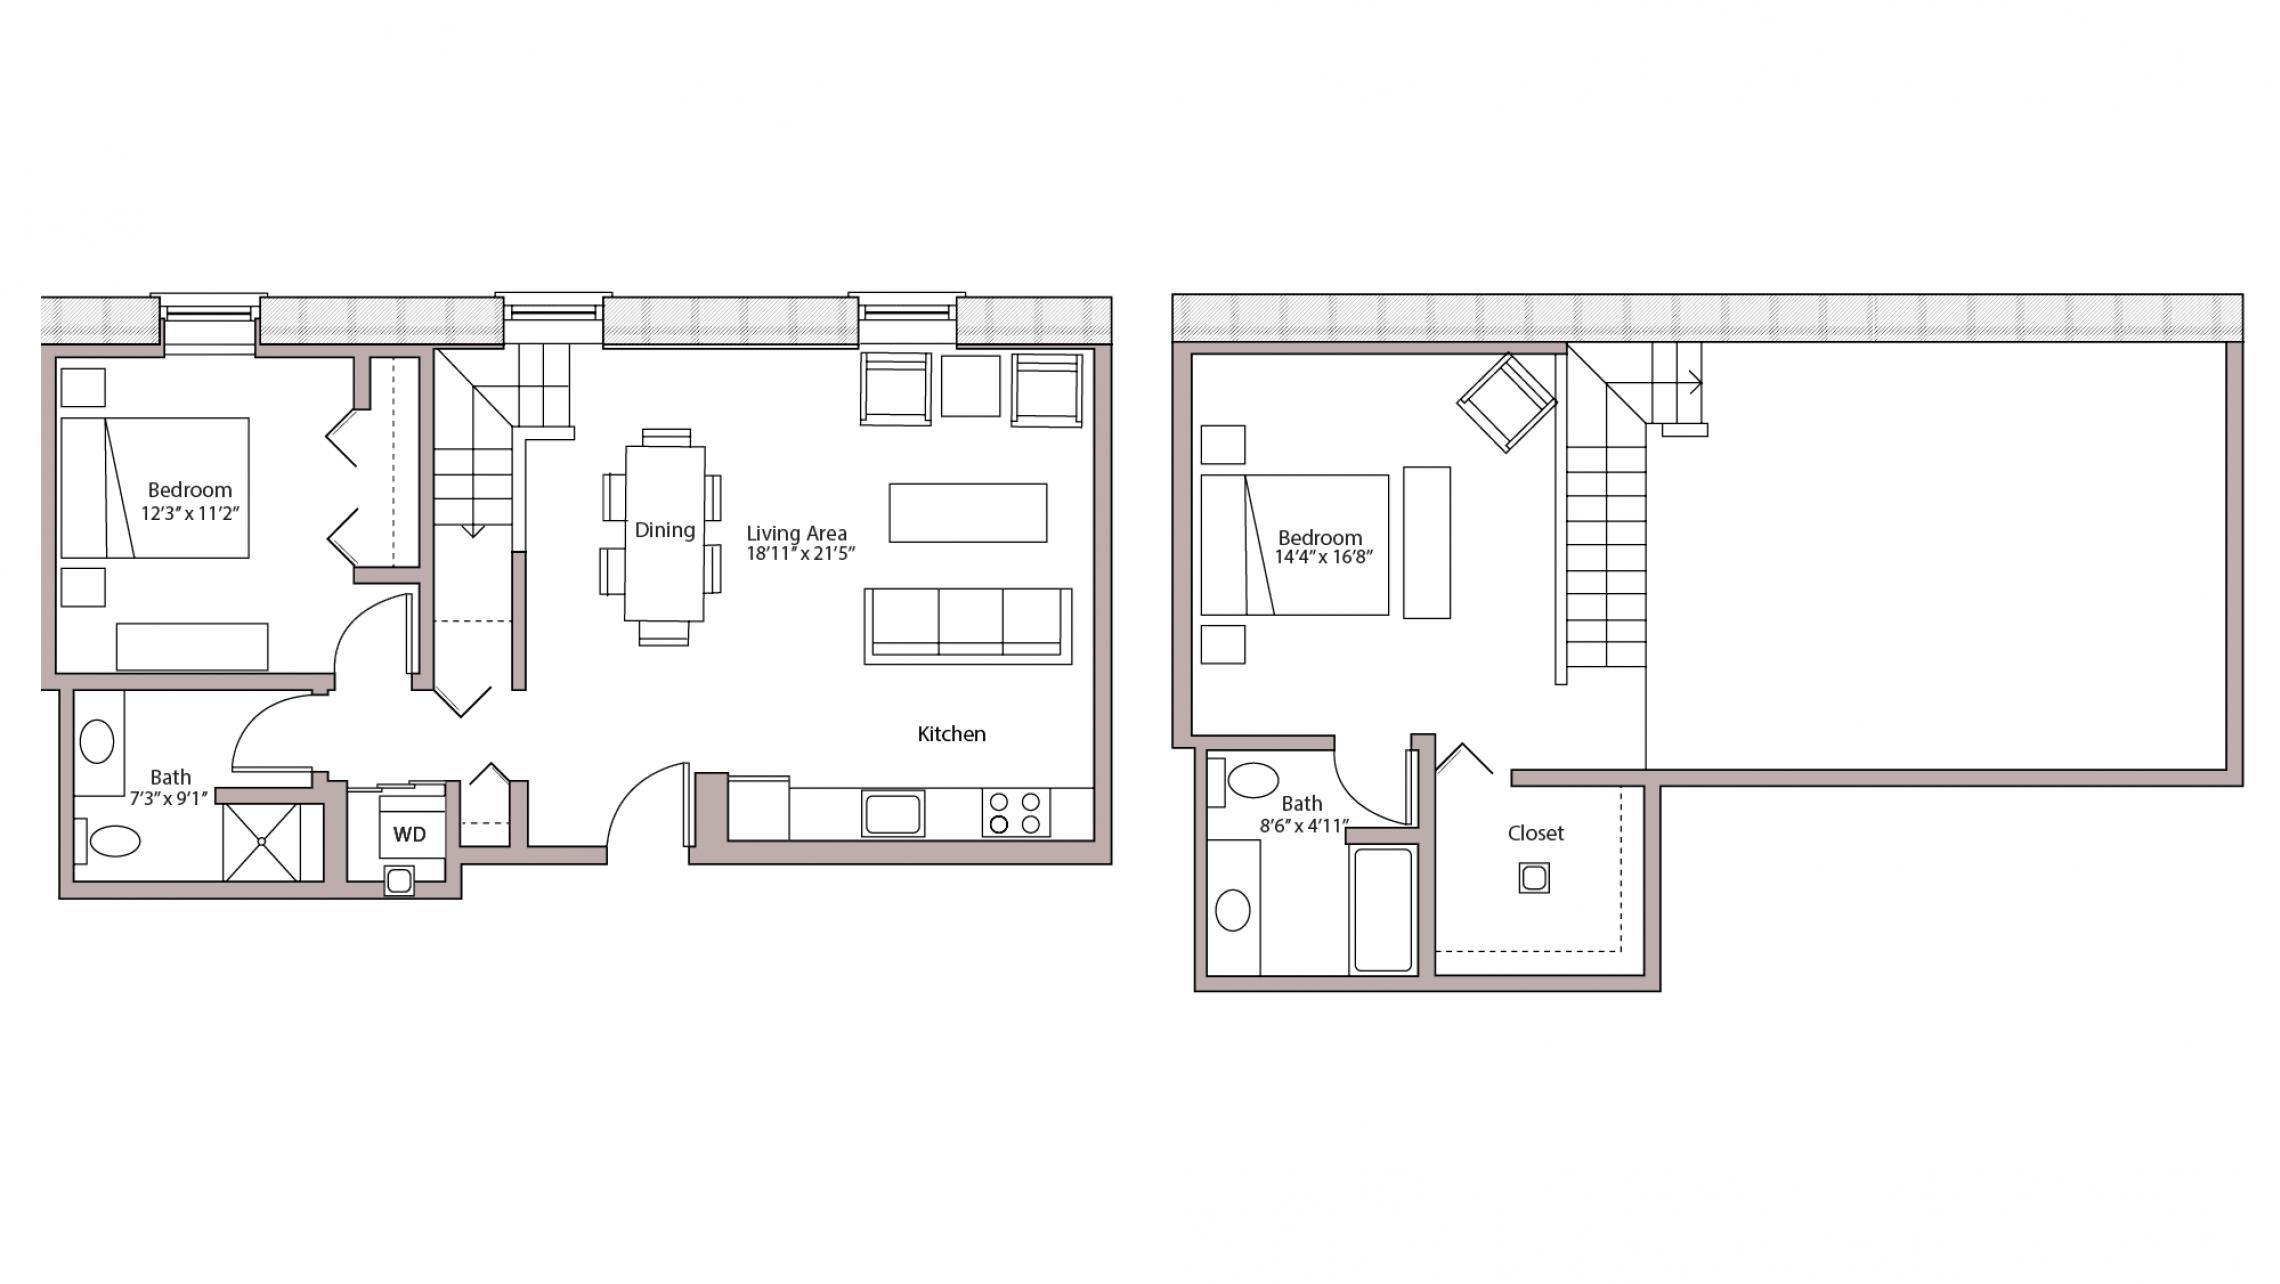 ULI Tobacco Lofts E305 - Two Bedroom, Two Bathroom